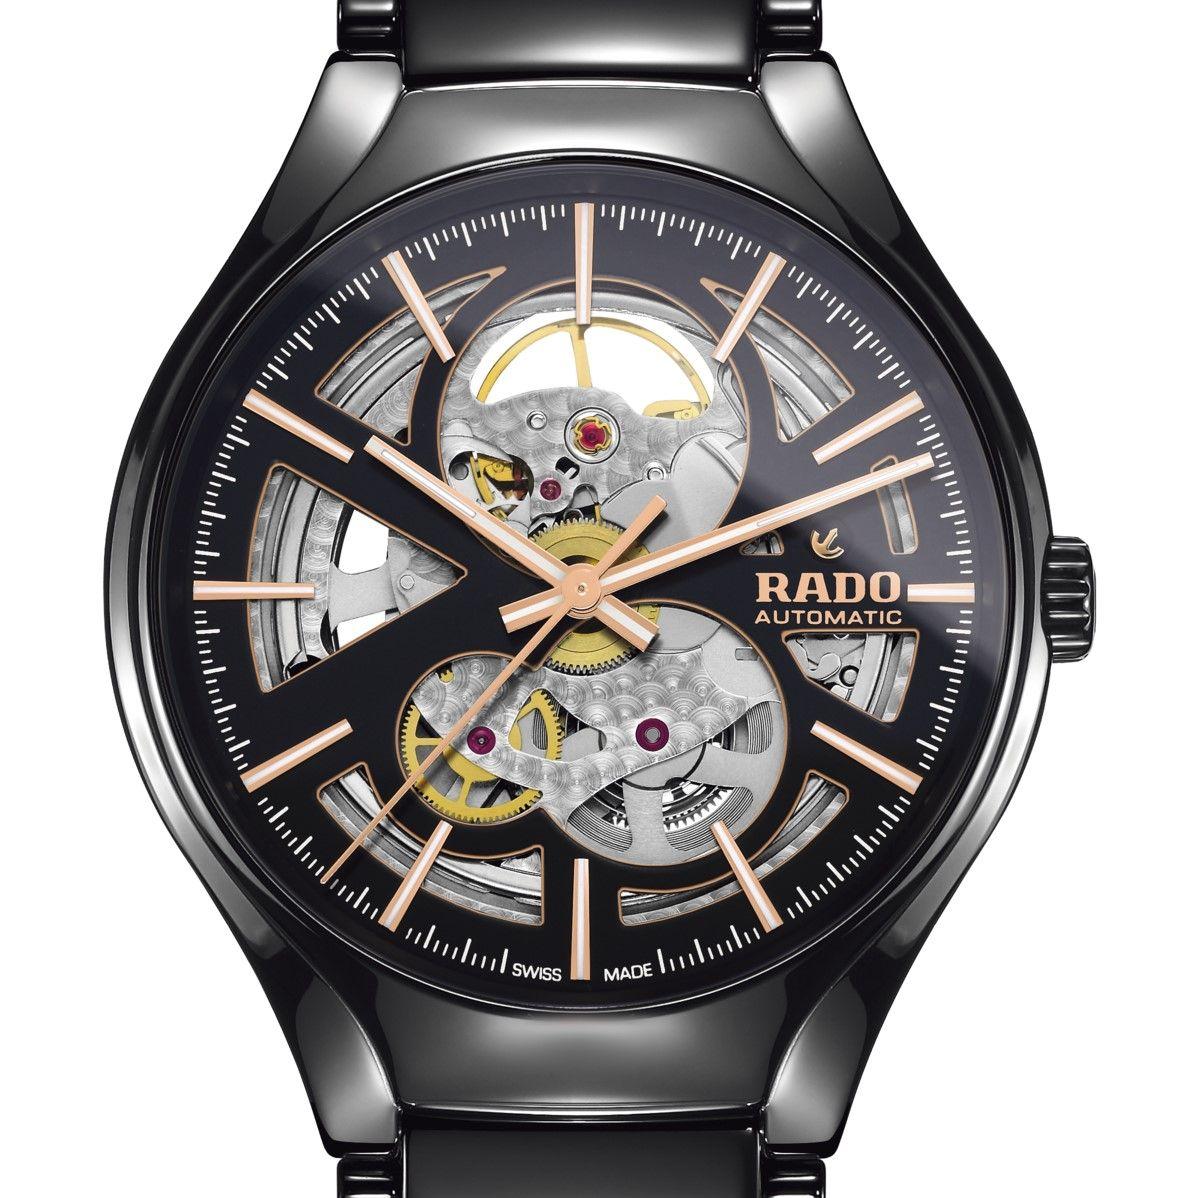 Rado Watch Price Qatar